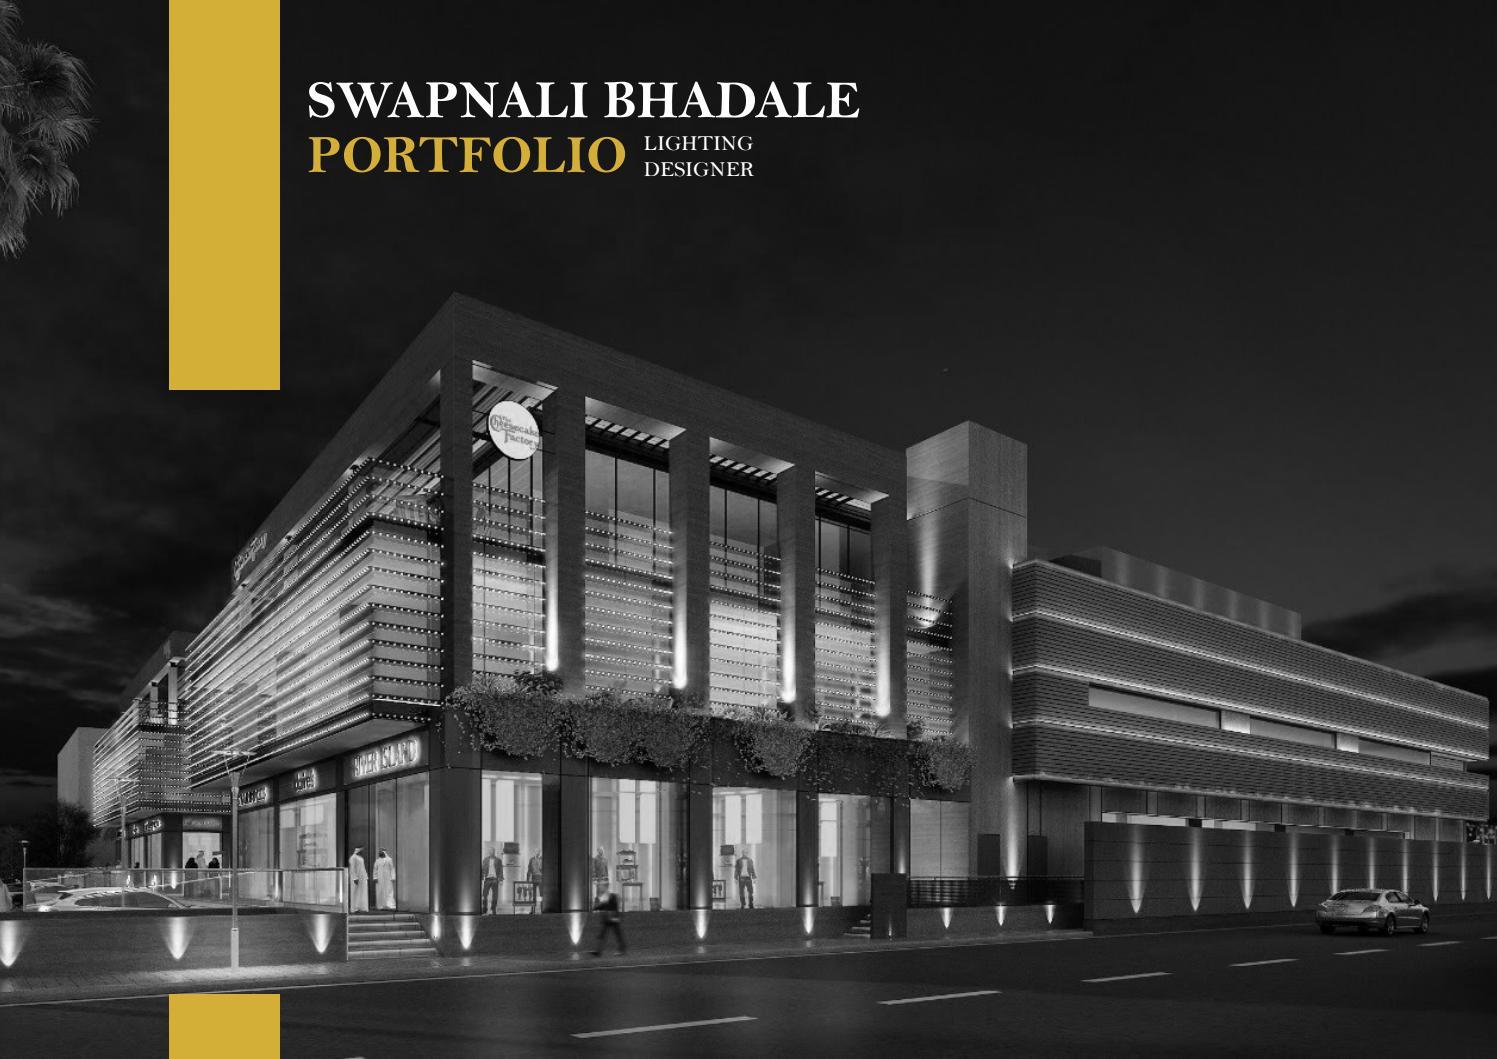 Lighting Design Portfolio 2019 By Swapnali Bhadale Issuu